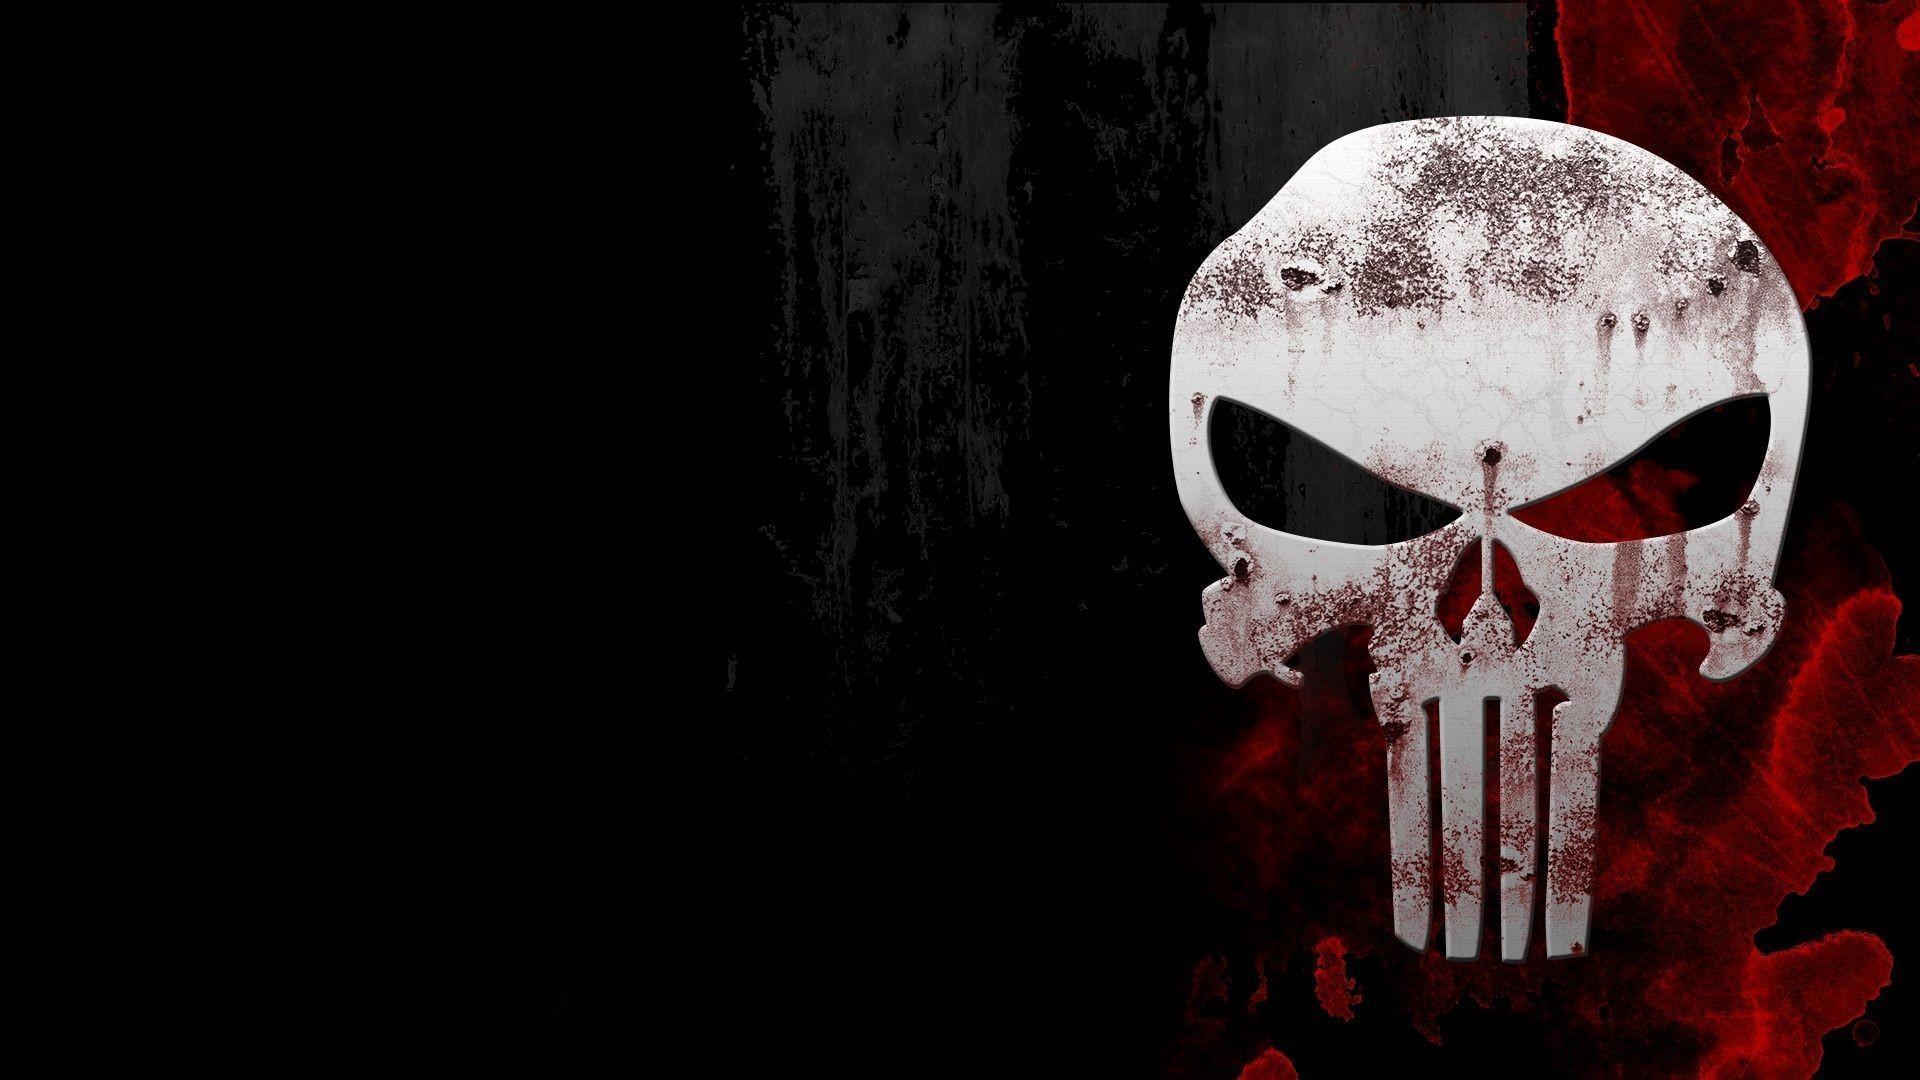 The Punisher Skull Wallpaper HD – HD Wallpaper